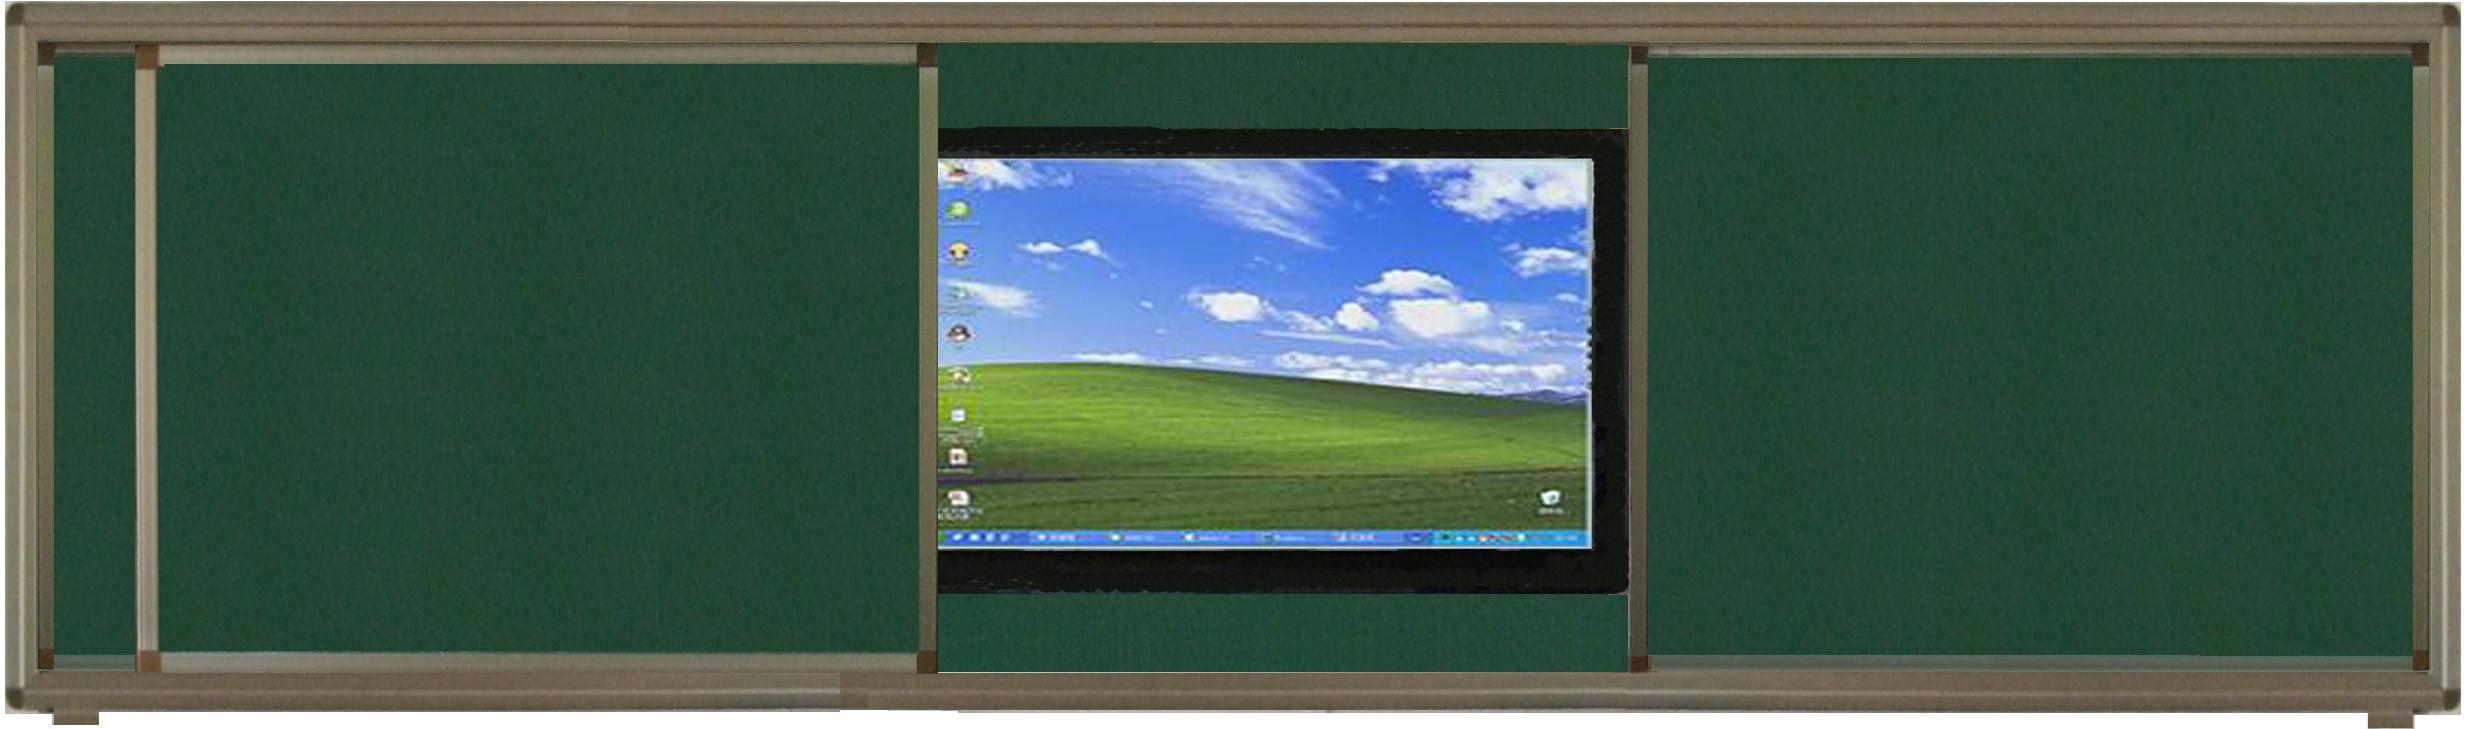 Pc电脑+电视黑板+组合型推拉黑板+云教育软件+可选项(电子讲台+中控+视频展台+音响+麦克风) 随着计算机技术的飞速发展,作为培养未来建设者基地的学校,率先承担了应用、研究、开发和培训人才的义务,并建立了以教学为主的计算机教室。计算机应用于教育系统,不仅作为学生学习的对象,同时更是一种现代化的教学手段,充分利用计算机技术的优势,发挥计算机辅助教学的功能。学校在筹建电子教室时,应考虑能达到计算机教学和计算机辅助教学两方面的功能。多媒体教学网络尤其是它的核心多媒体网络教室,充分体现了网络多媒体教学中所蕴涵的